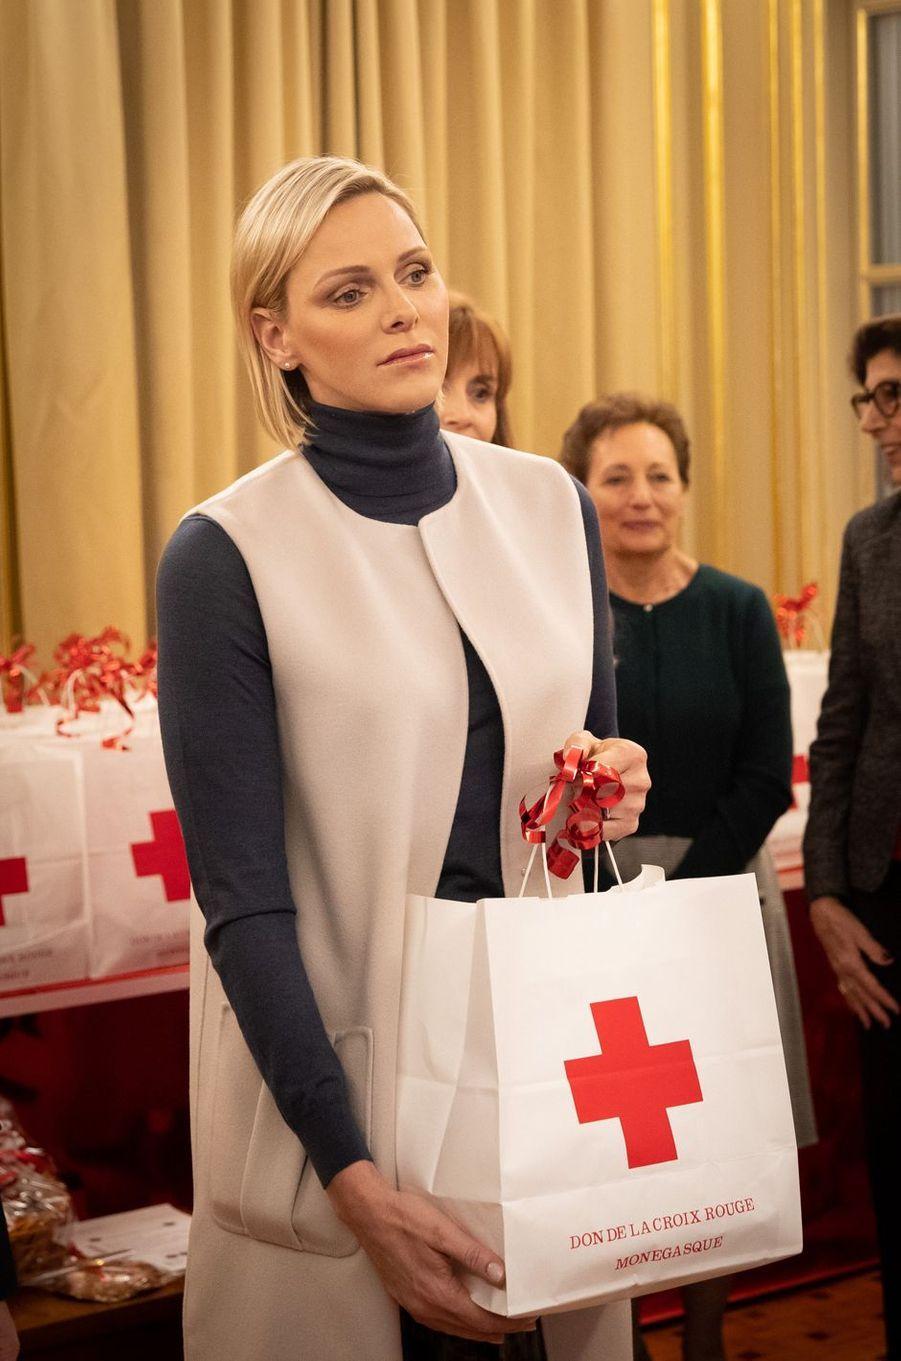 La princesse Charlène de Monaco à Monaco, le 15 novembre 2019